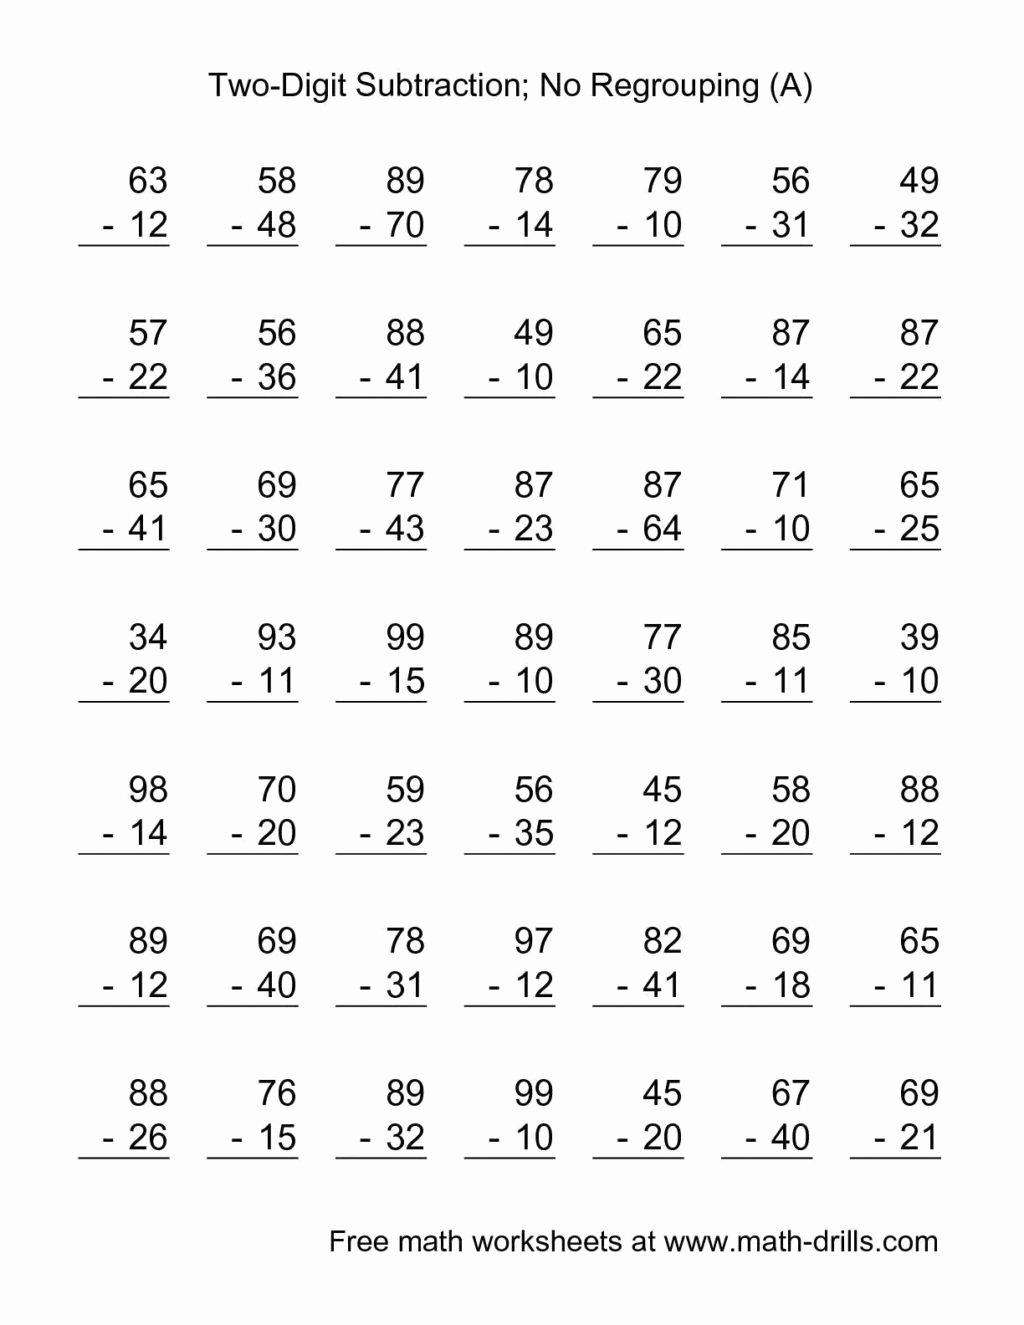 Simple Addition and Subtraction Worksheets for Preschoolers Fresh Worksheet Worksheet Free Math Worksheets Second Grade